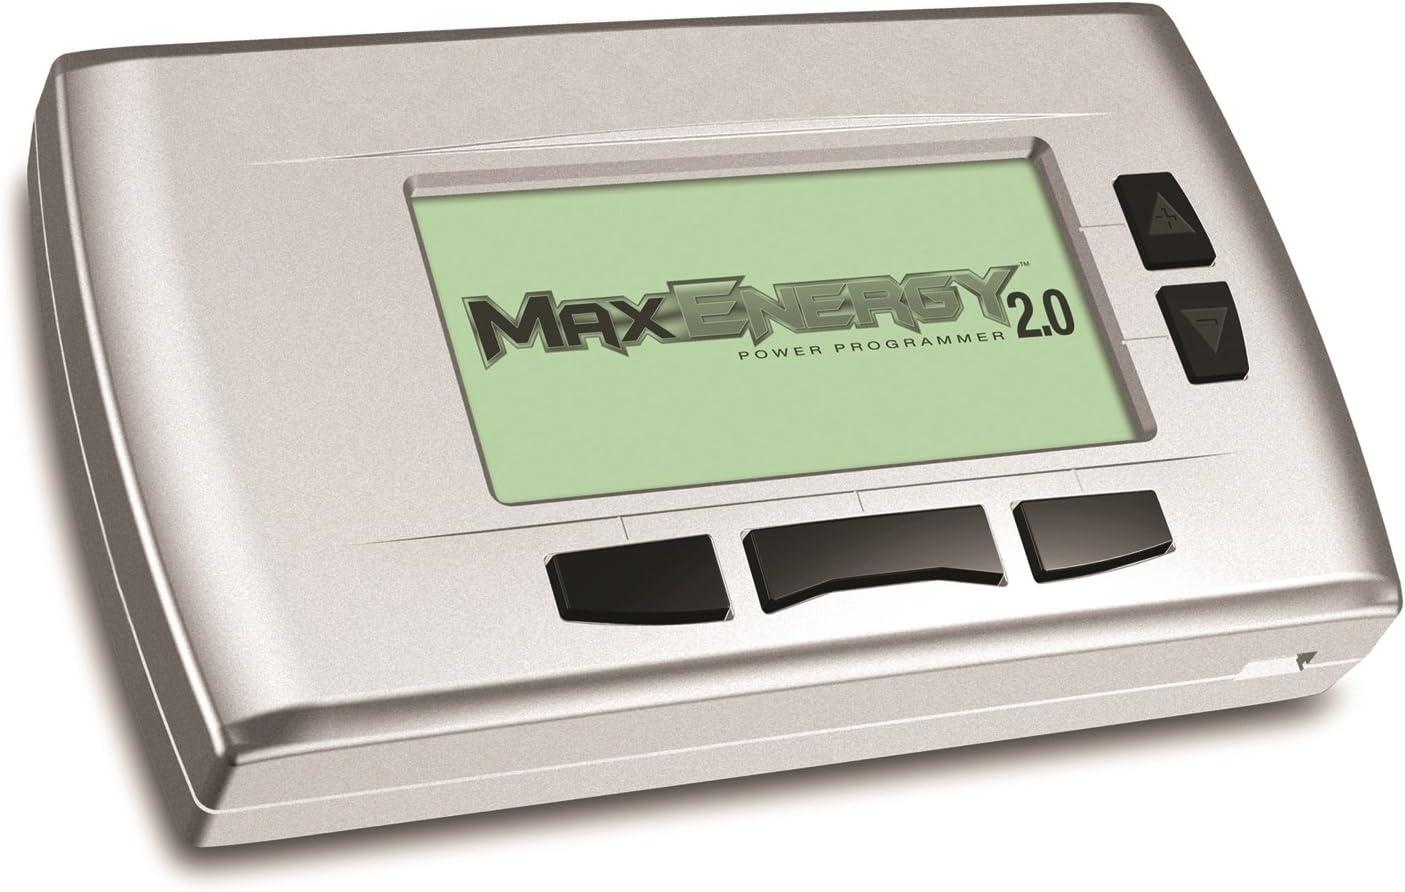 Hypertech 2100 Max Energy 2.0